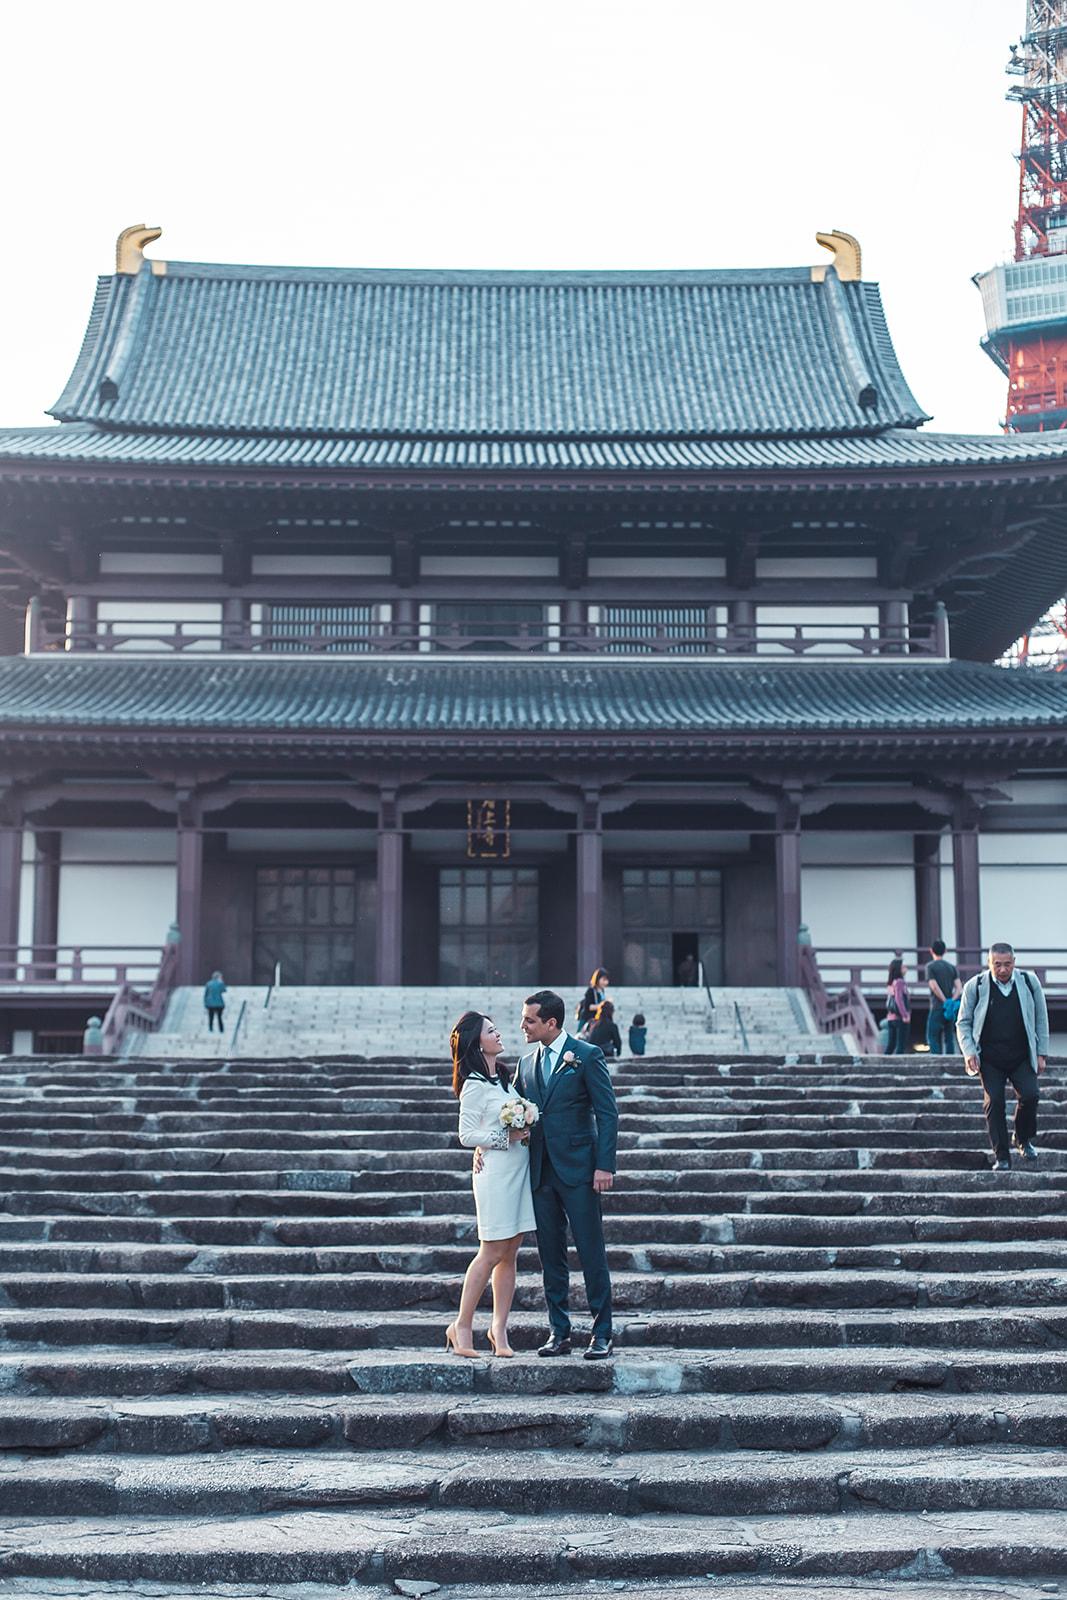 Prewedding pre wedding engagement in Tokyo Japan hire photographer (5).jpg